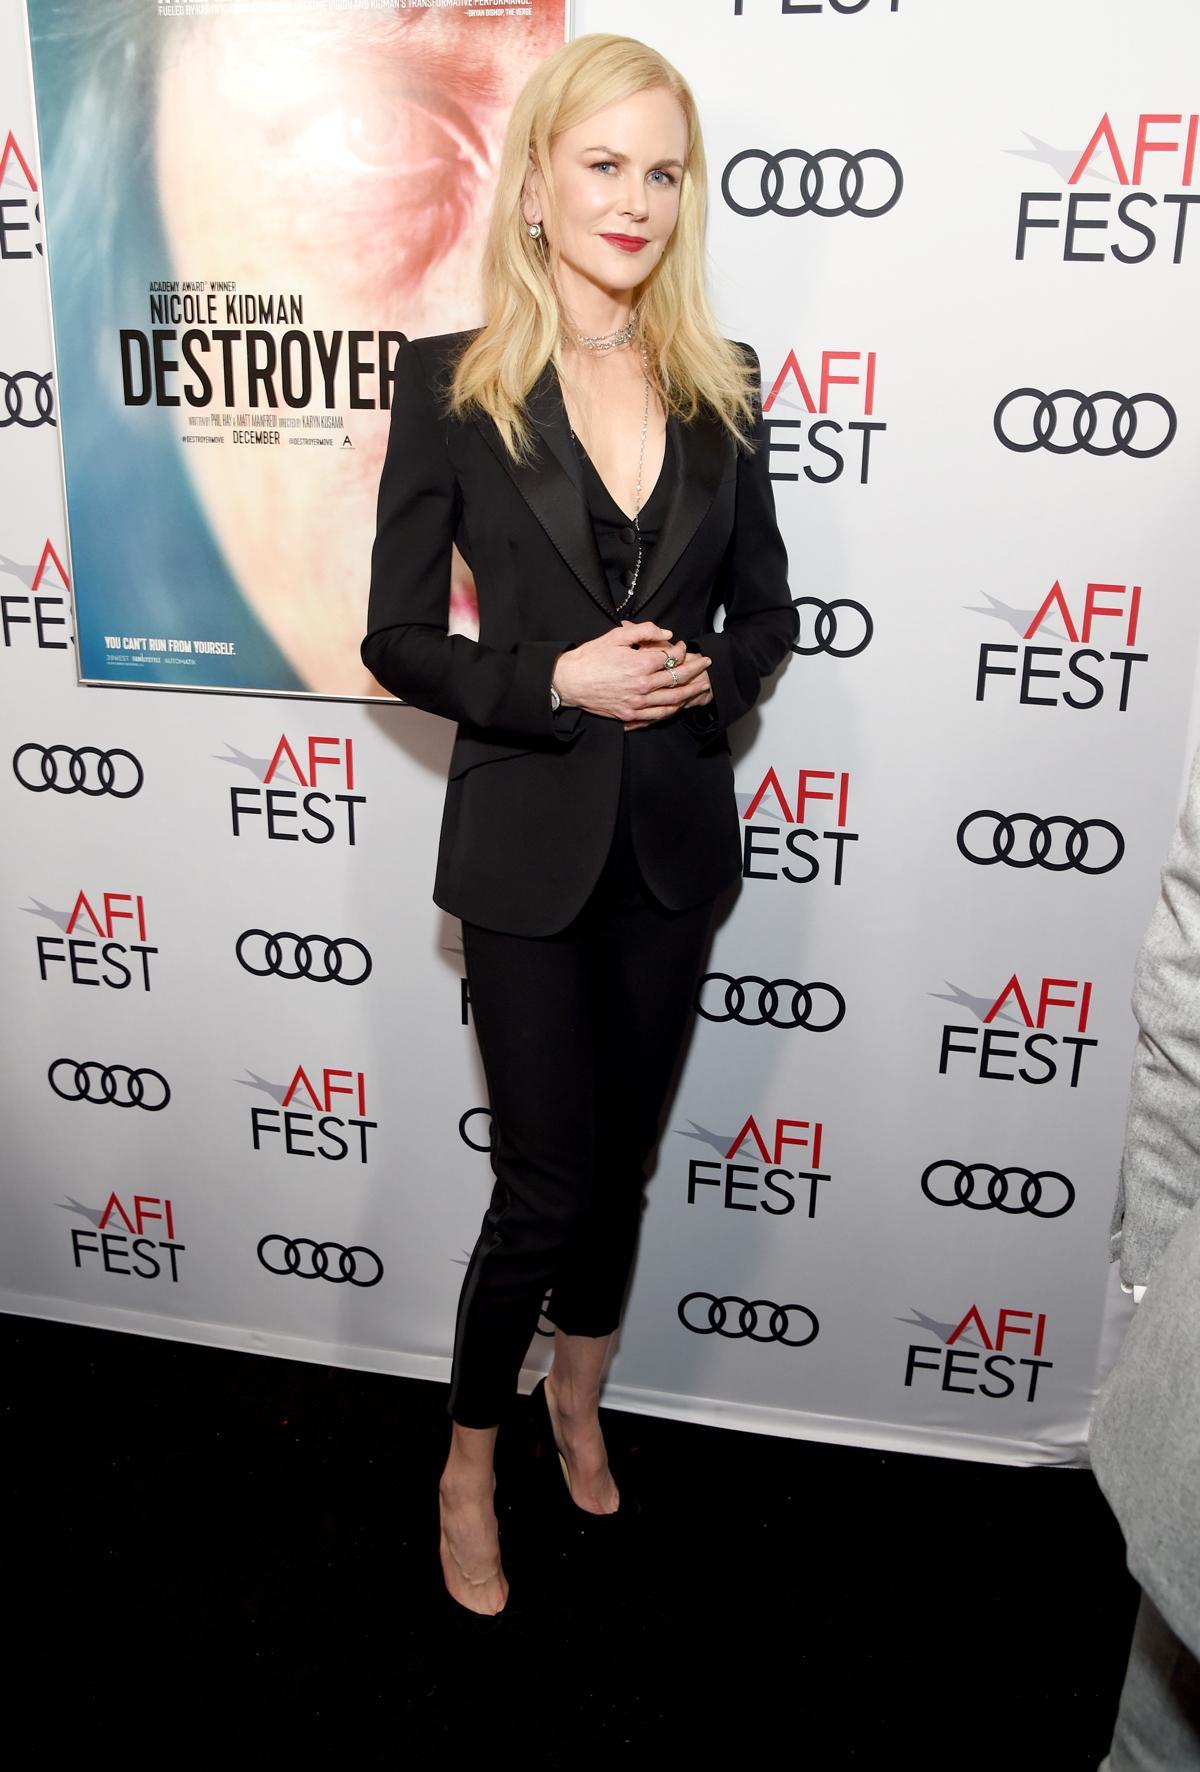 505674ebe6d The  1 Way Nicole Kidman Styles Skinny Jeans